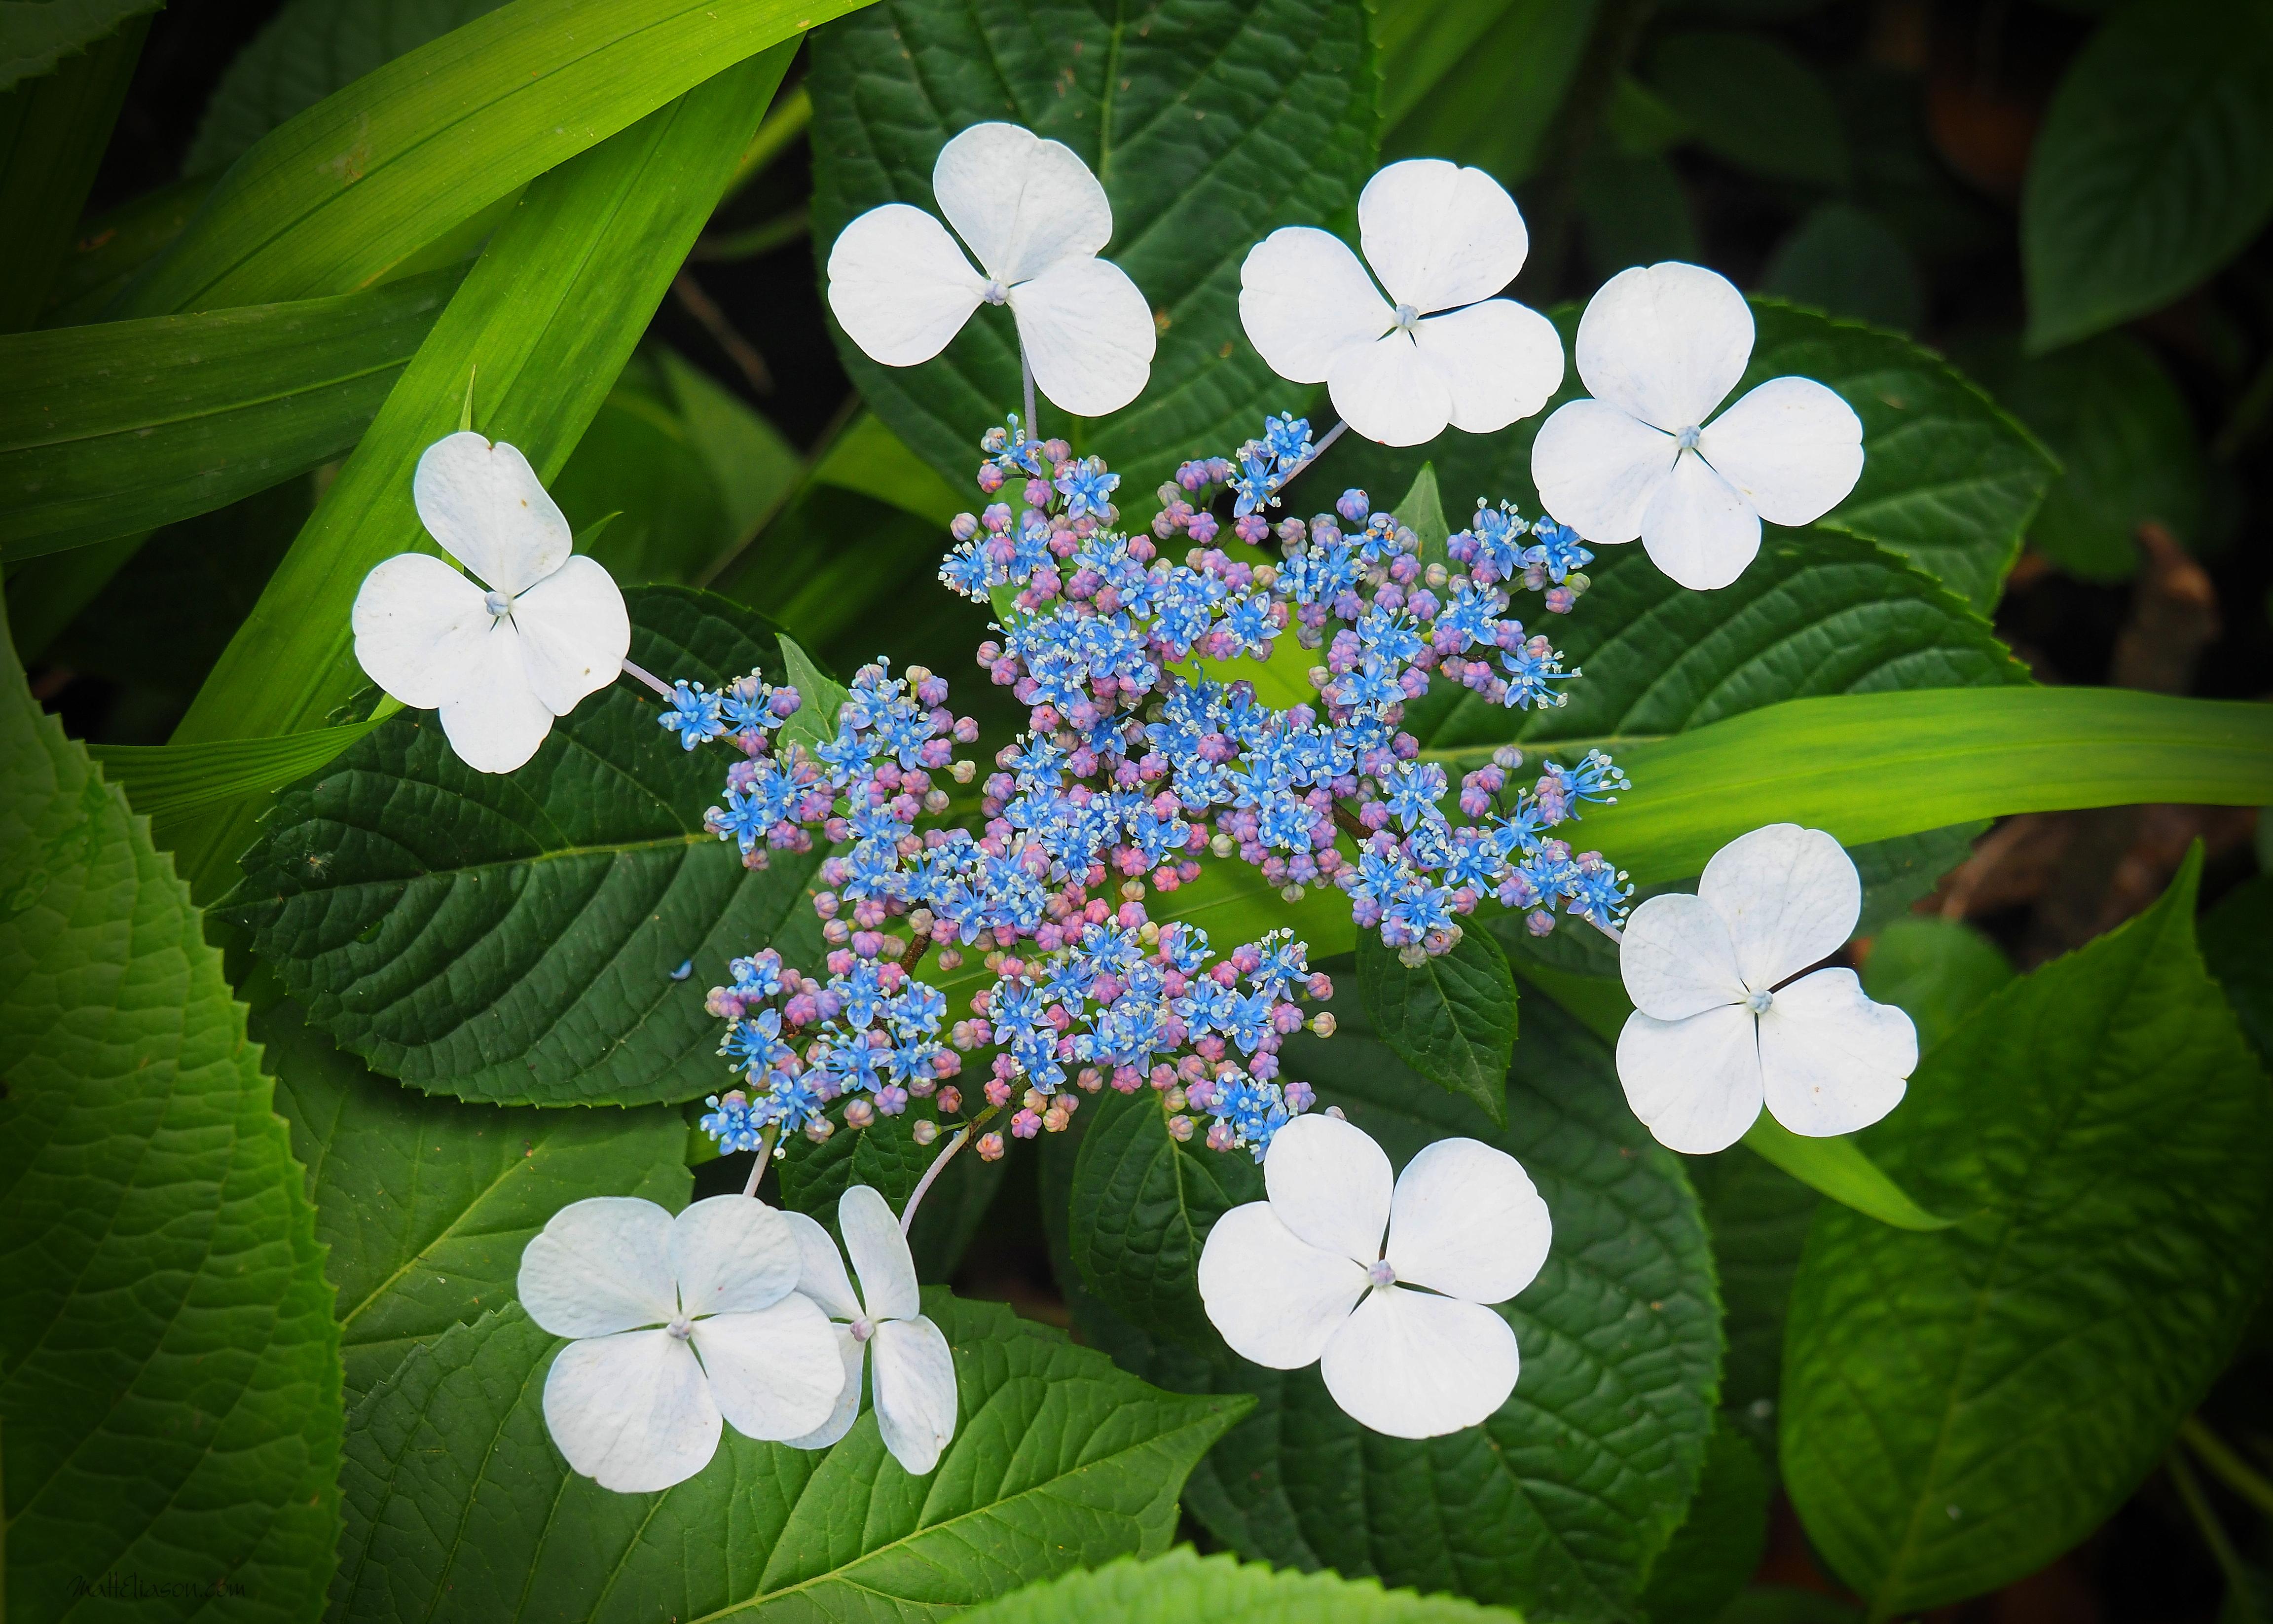 White flowers around blue mightylinksfo